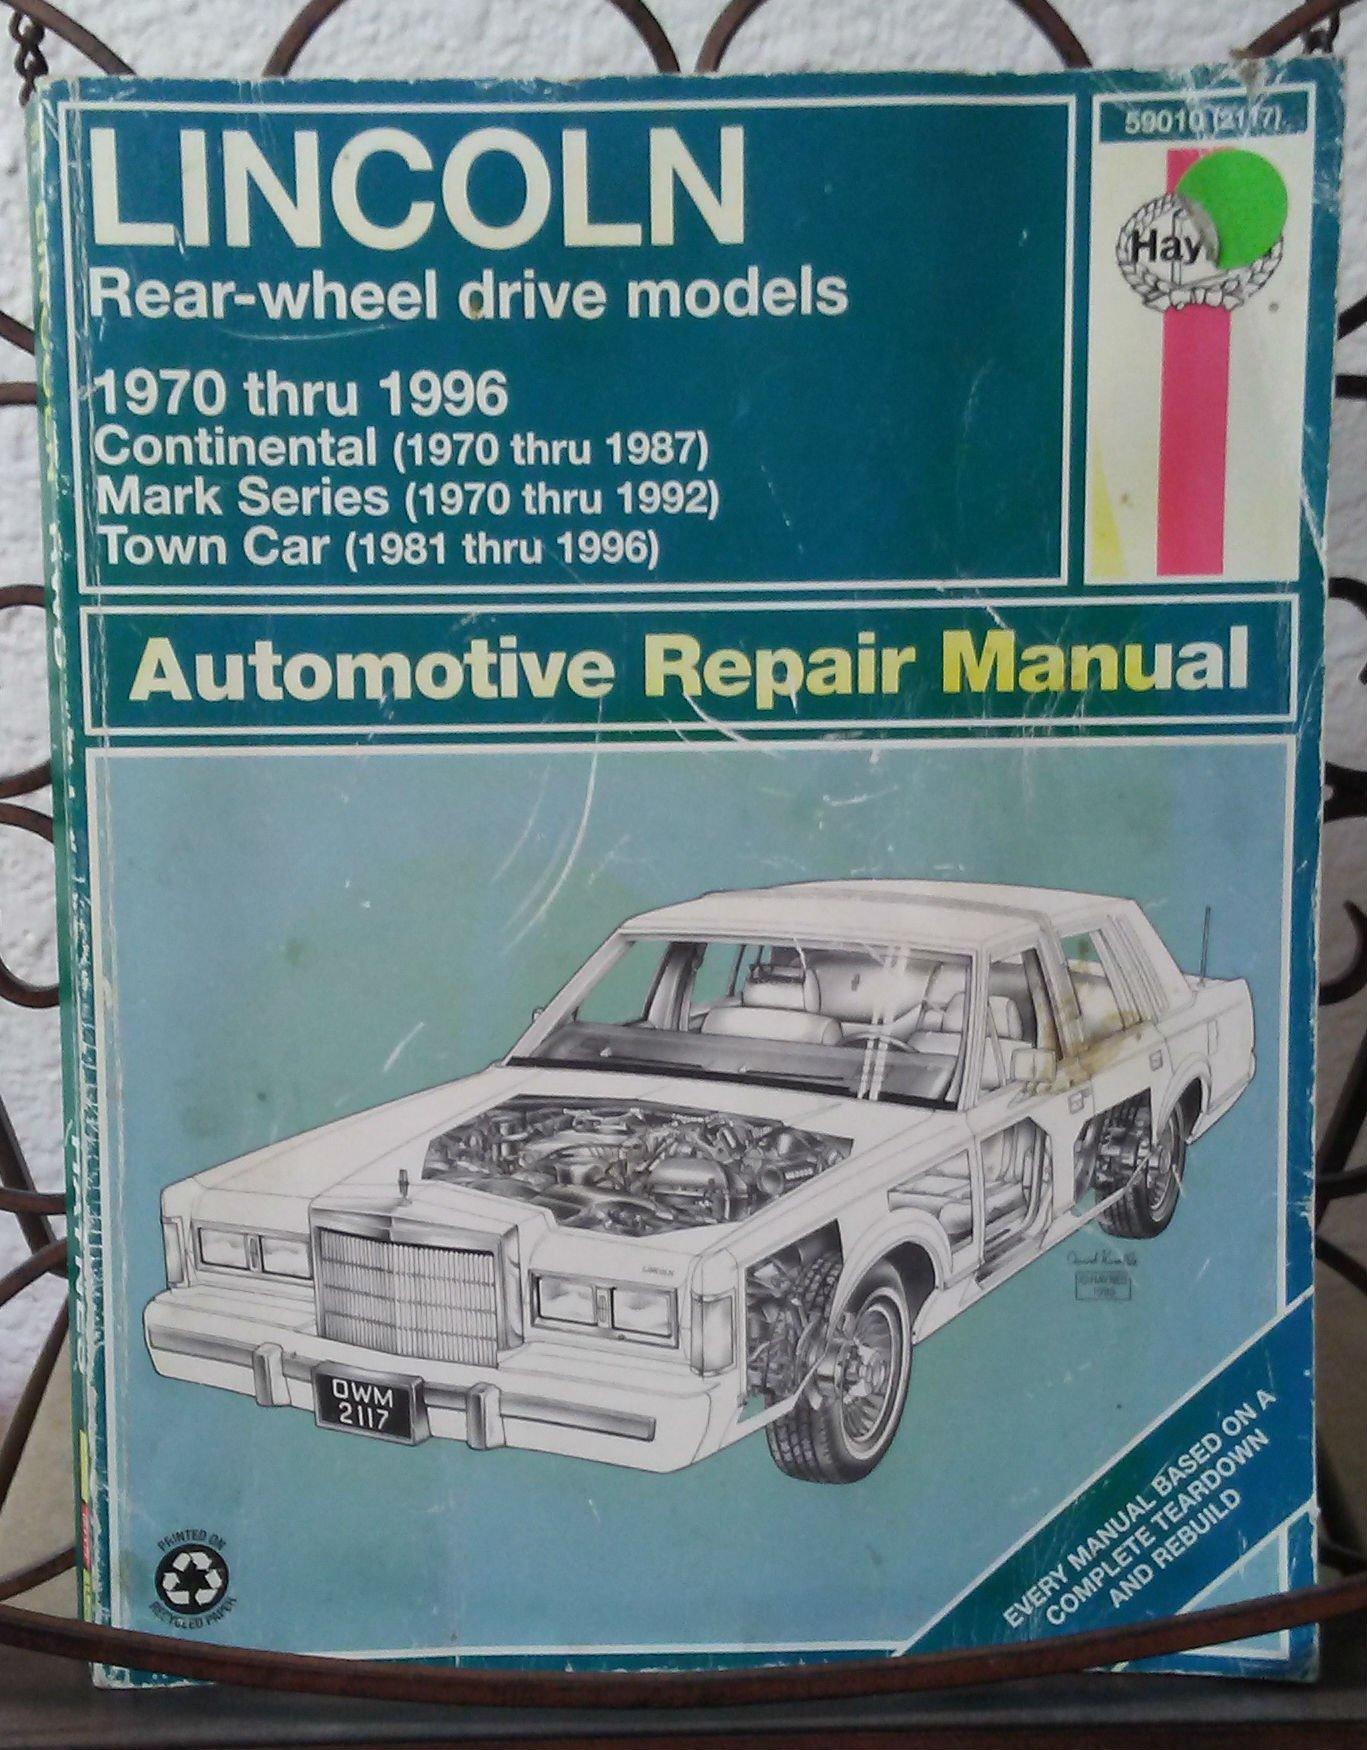 Lincoln Rear-Wheel Drive Automotive Repair Manual: 1970-96 (Haynes  Automotive Repair Manuals): Mark Ryan: 9781563922404: Amazon.com: Books